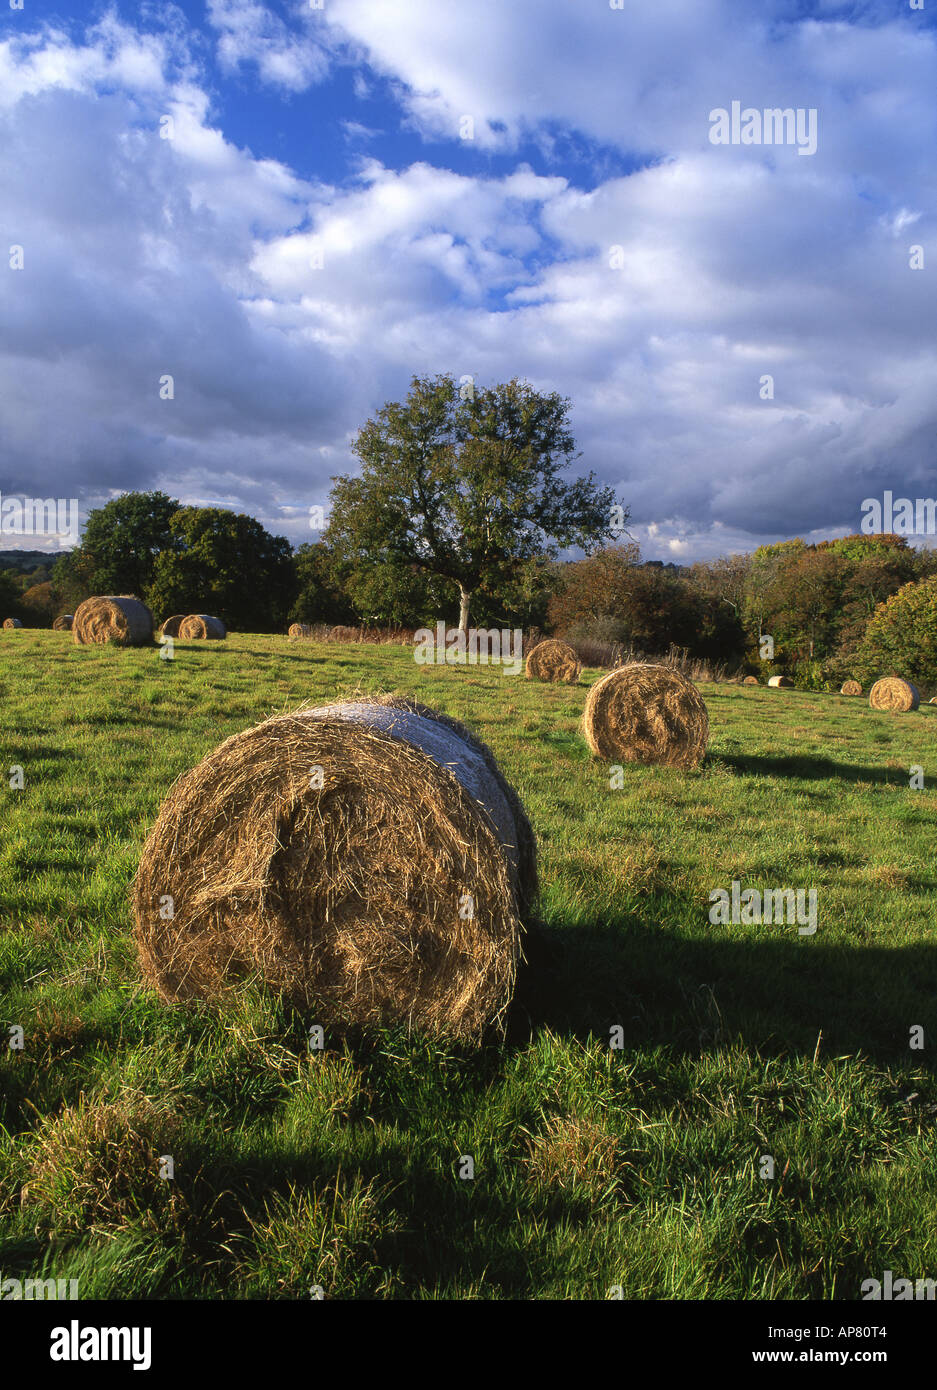 Hayfield Vale of Glamorgan Wales UK - Stock Image